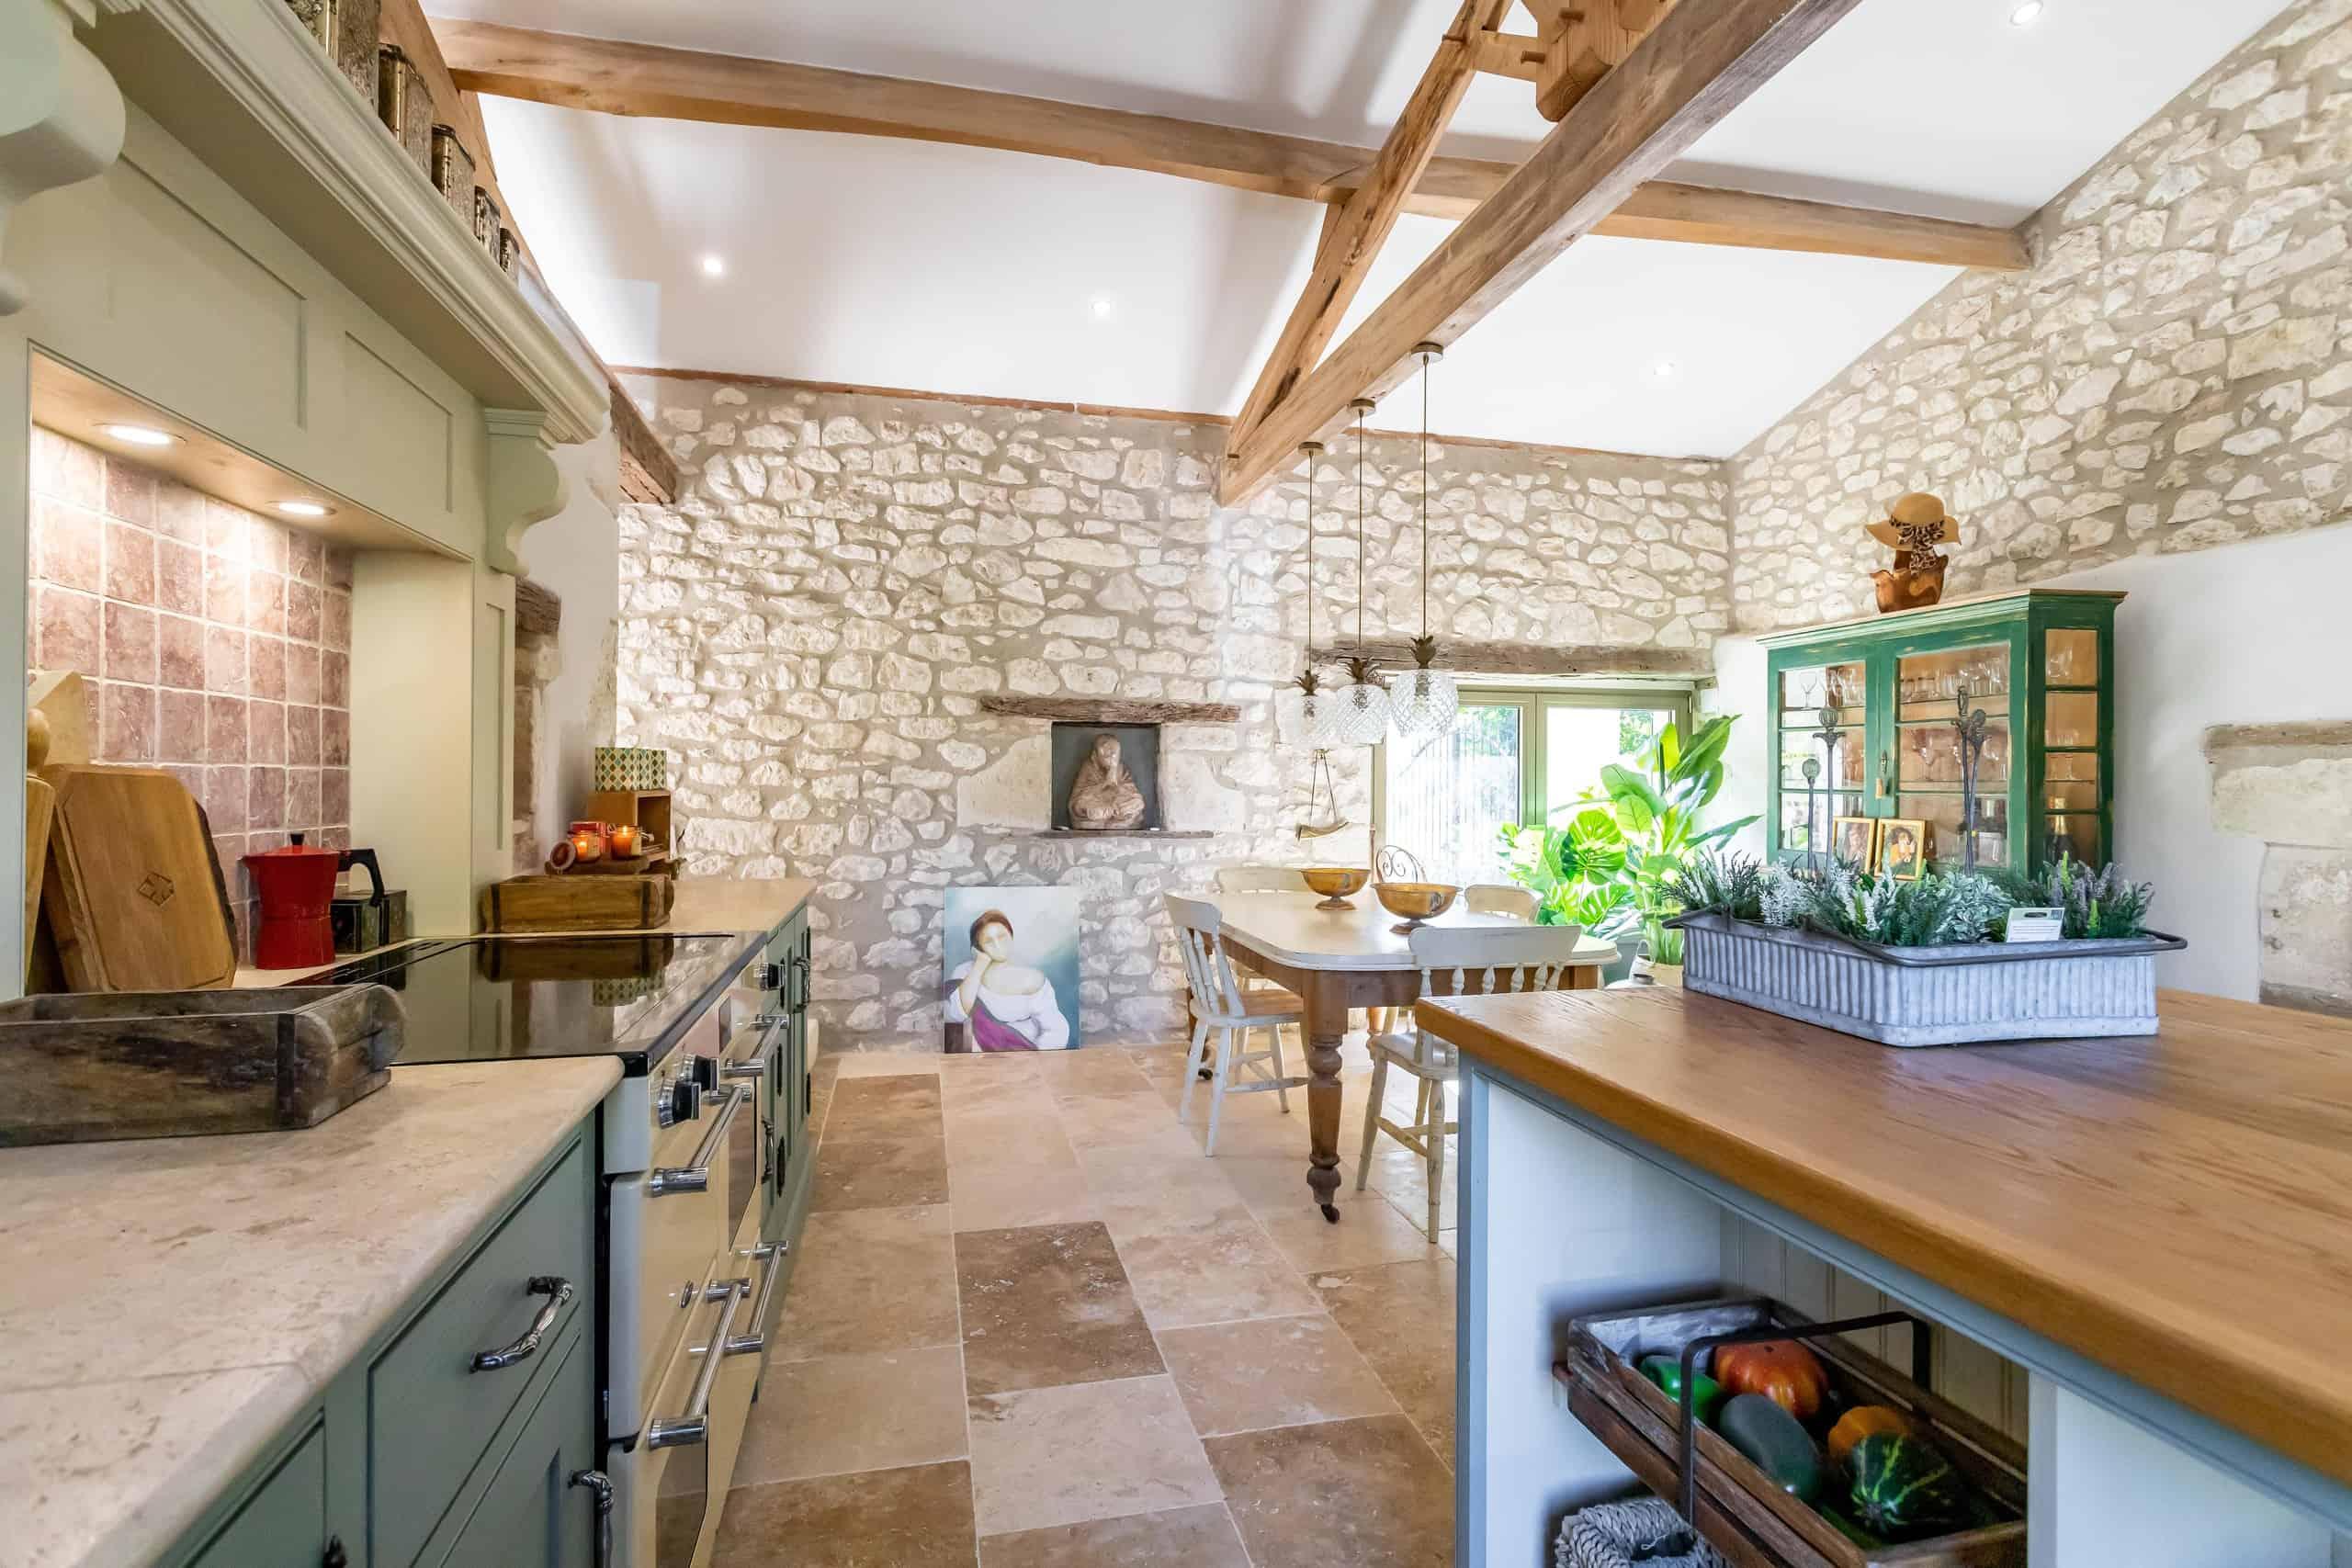 Kitchen-table-WMC108